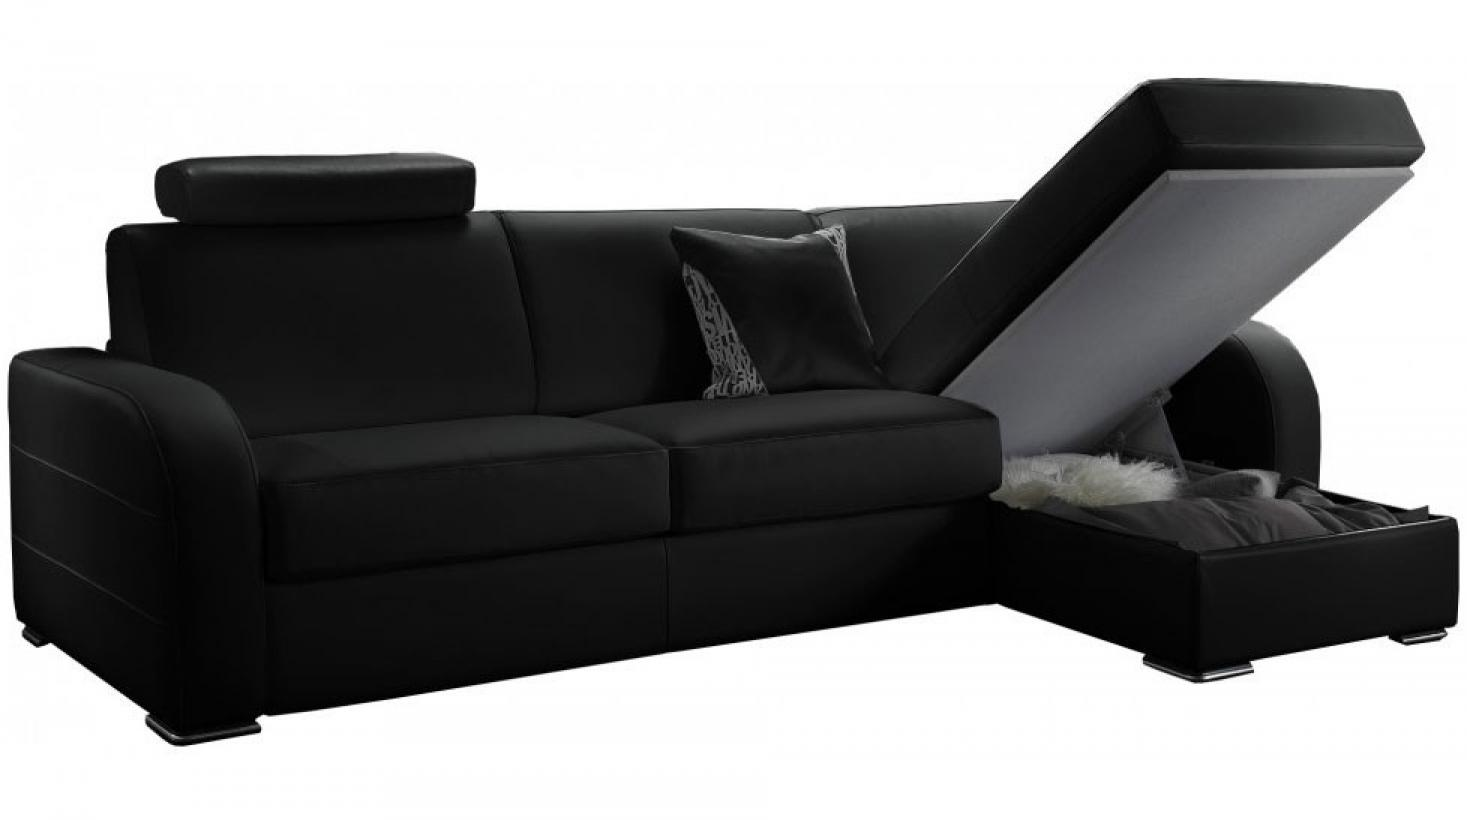 photos canap d 39 angle convertible pas cher en tissu. Black Bedroom Furniture Sets. Home Design Ideas